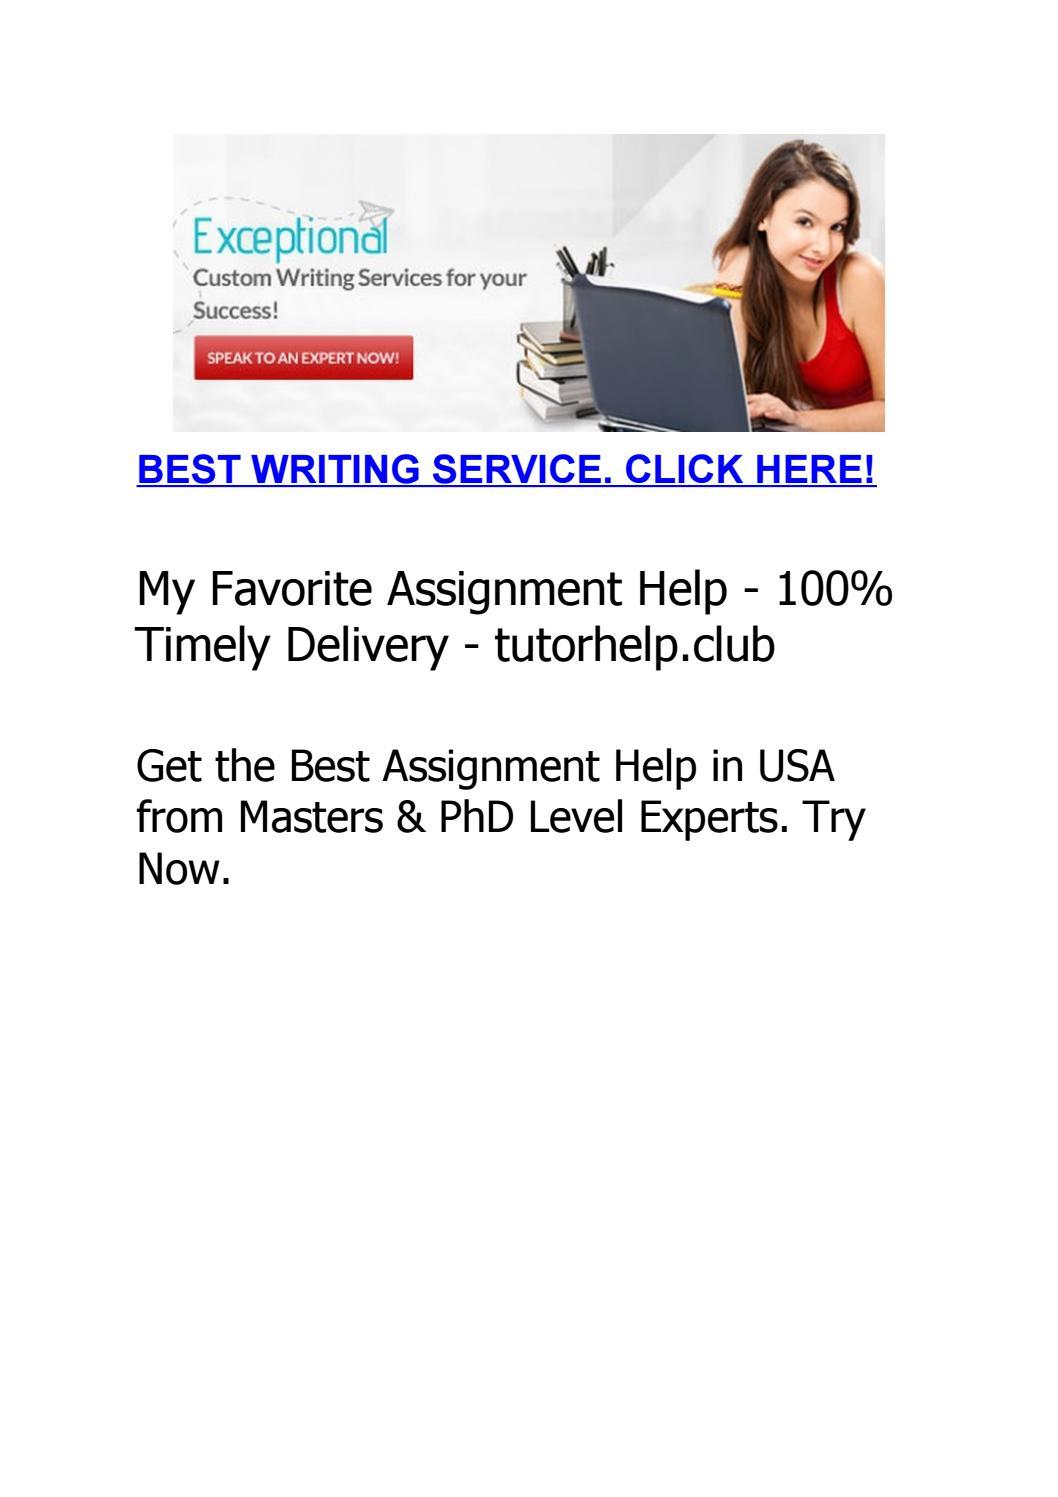 Blog writing service australia